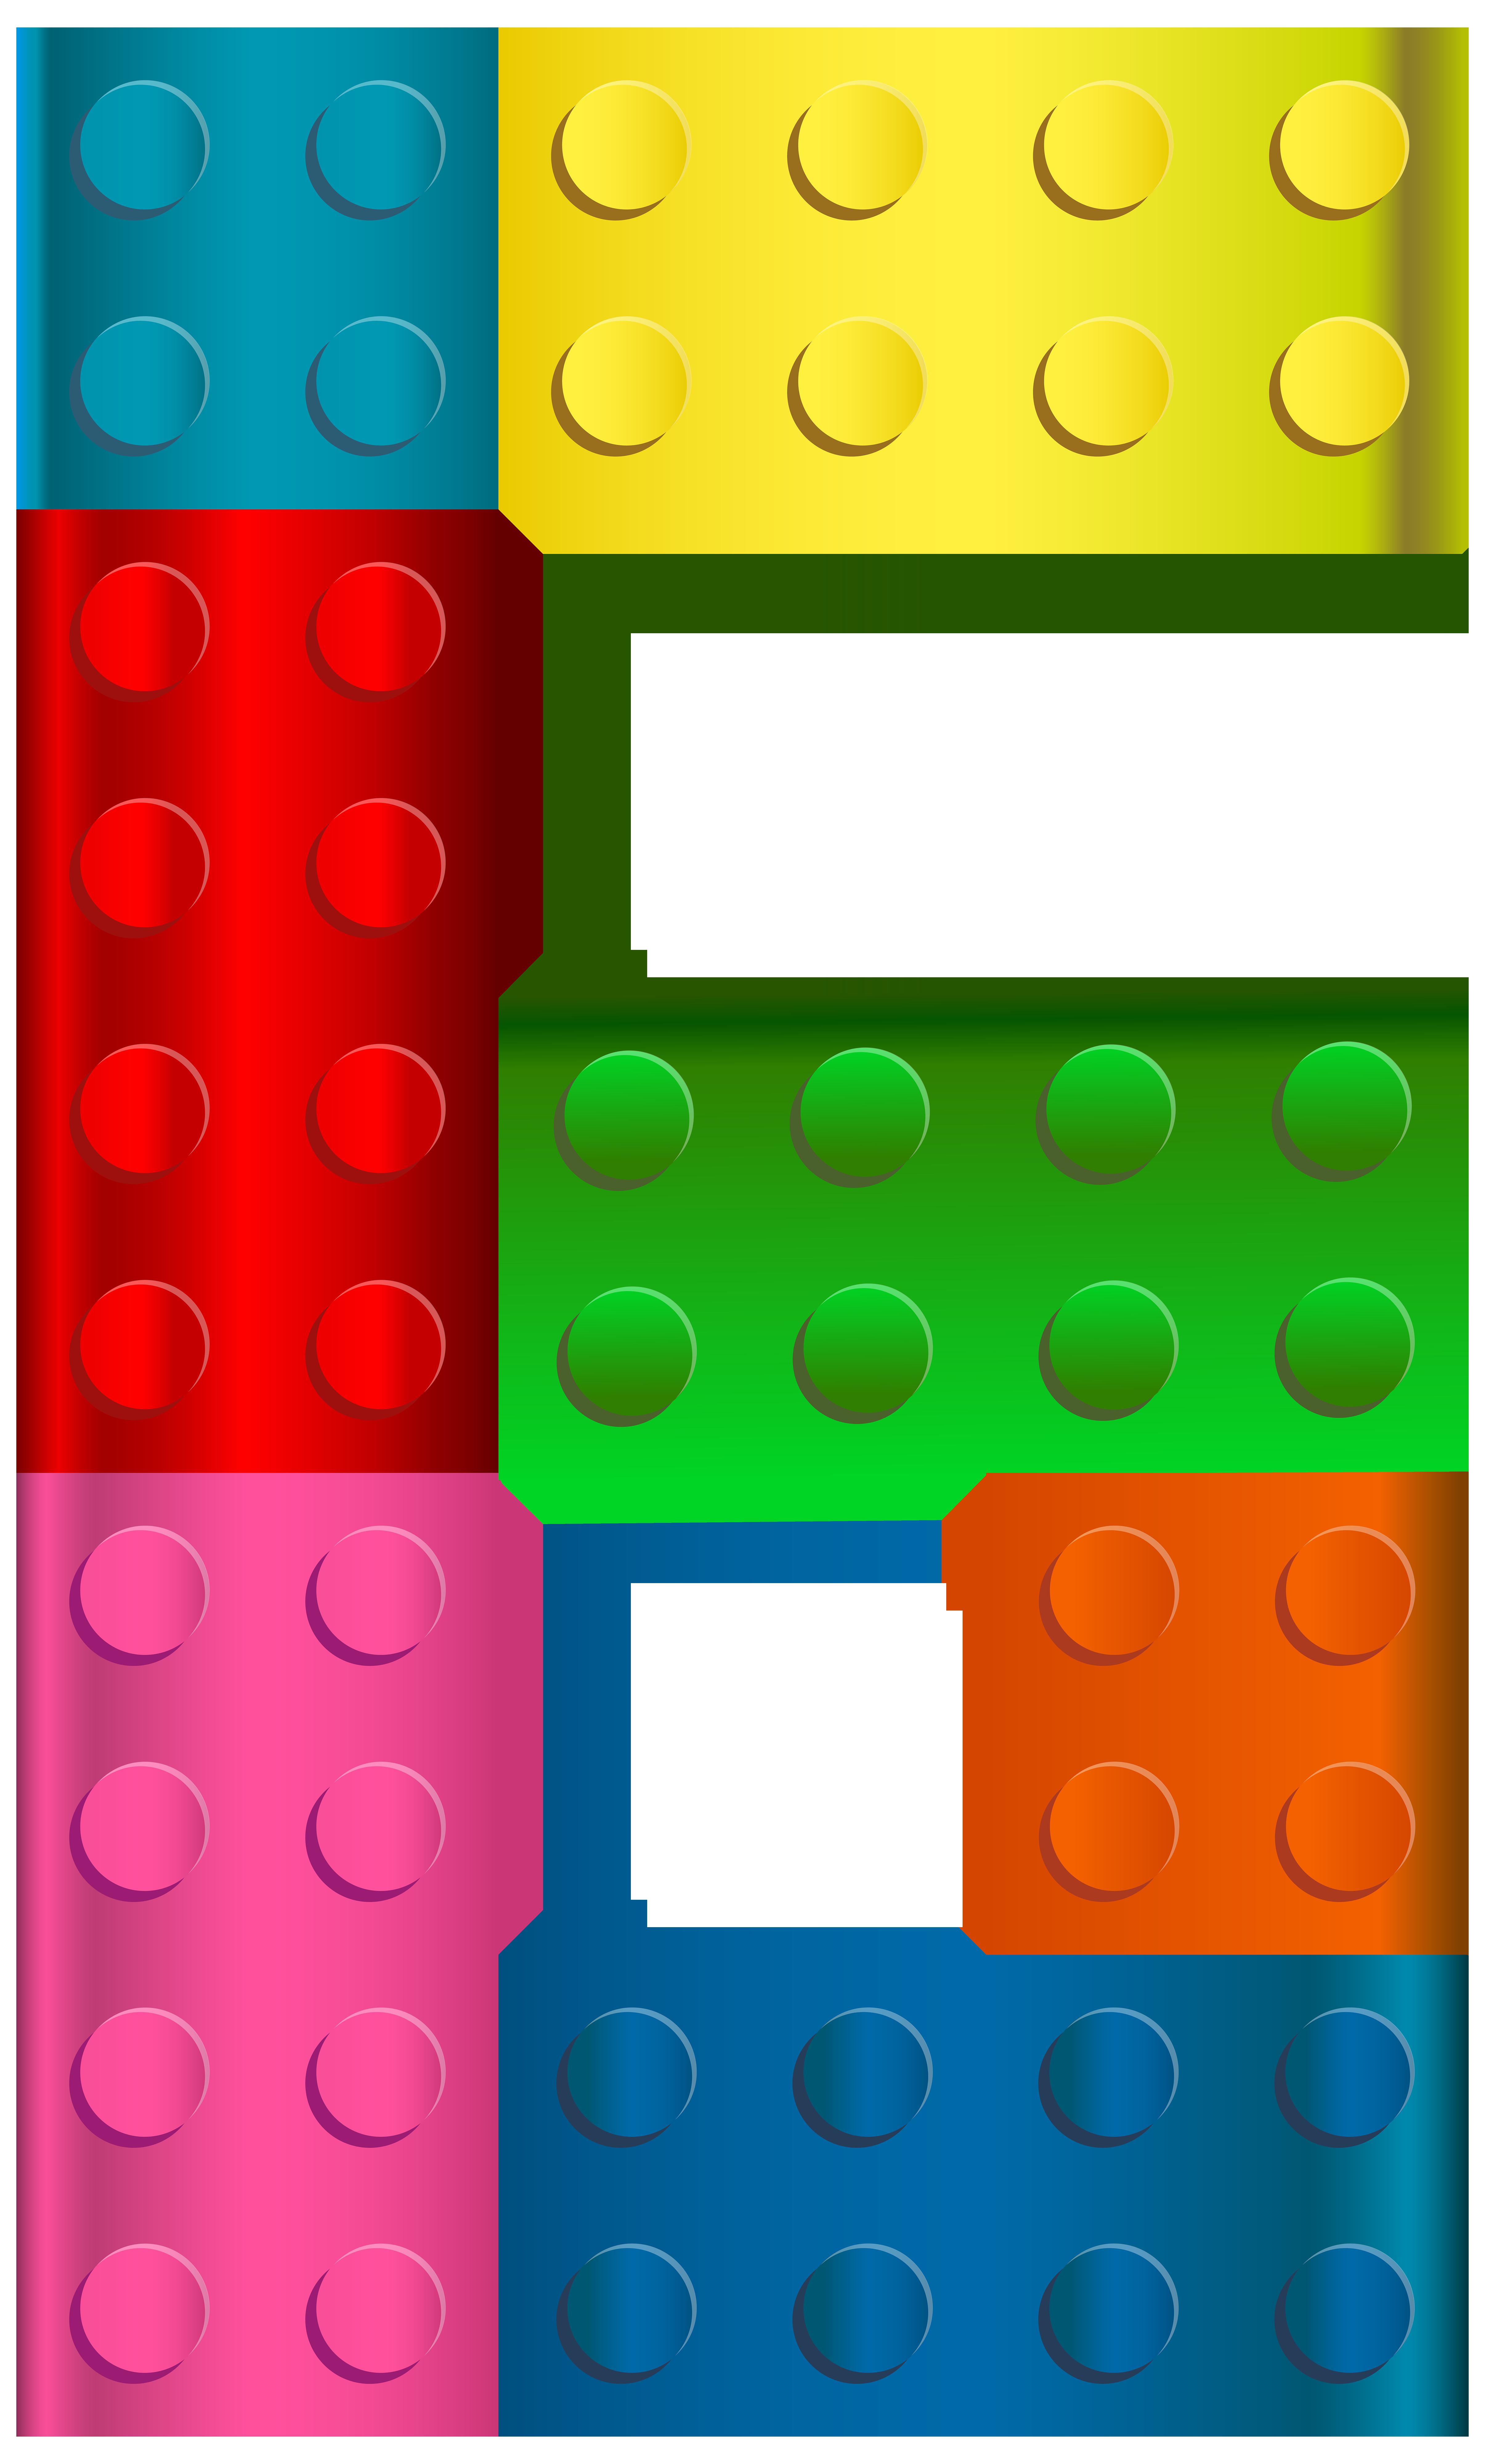 Lego Number Six PNG Transparent Clip Art Image.